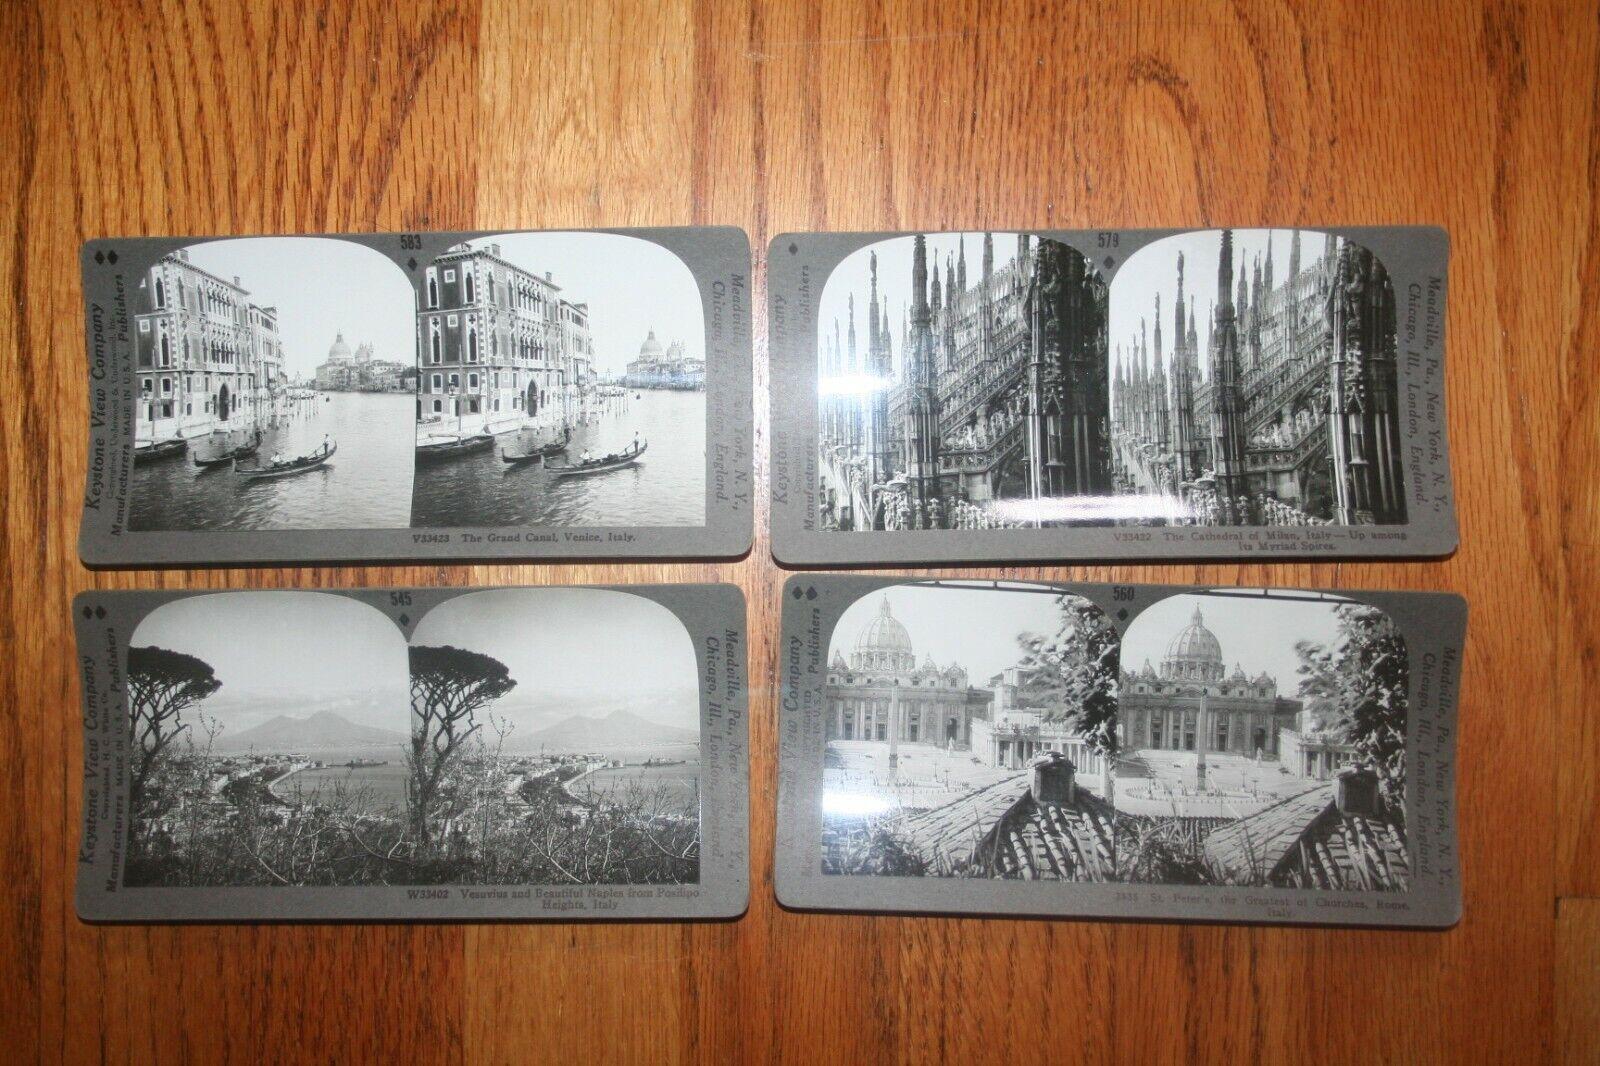 4 Stereo Cards/Stereoviews. Views Of Italy, 1920s - $5.00